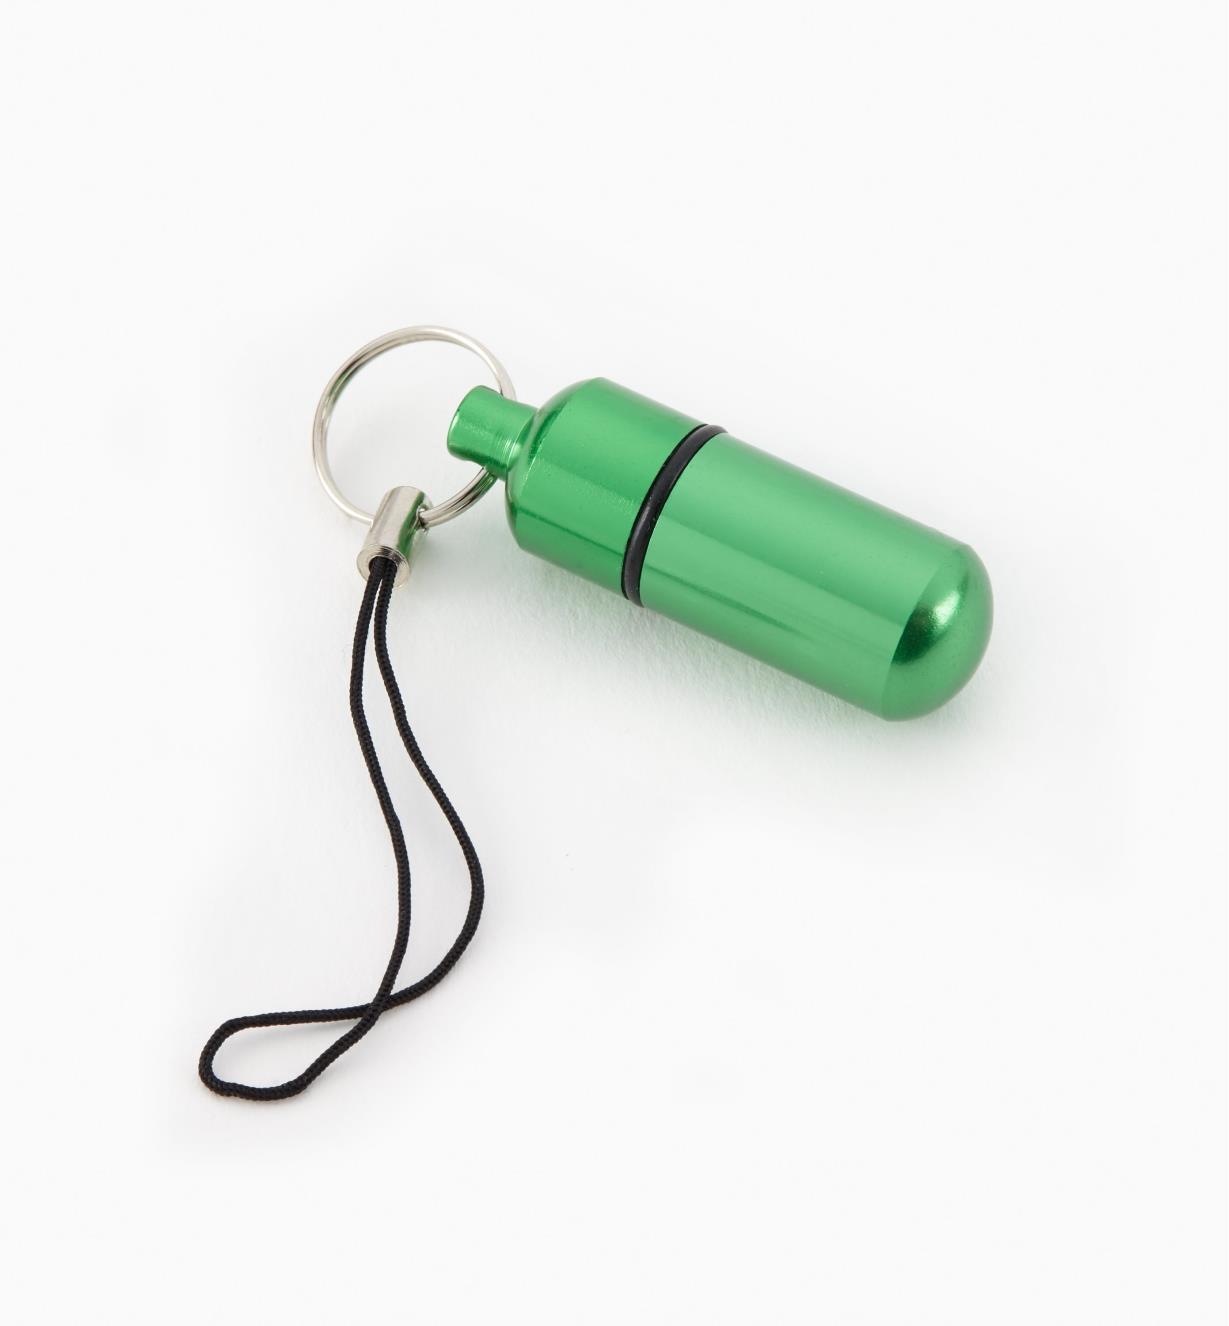 09A0748 - UC10 Green Capsule, ea.